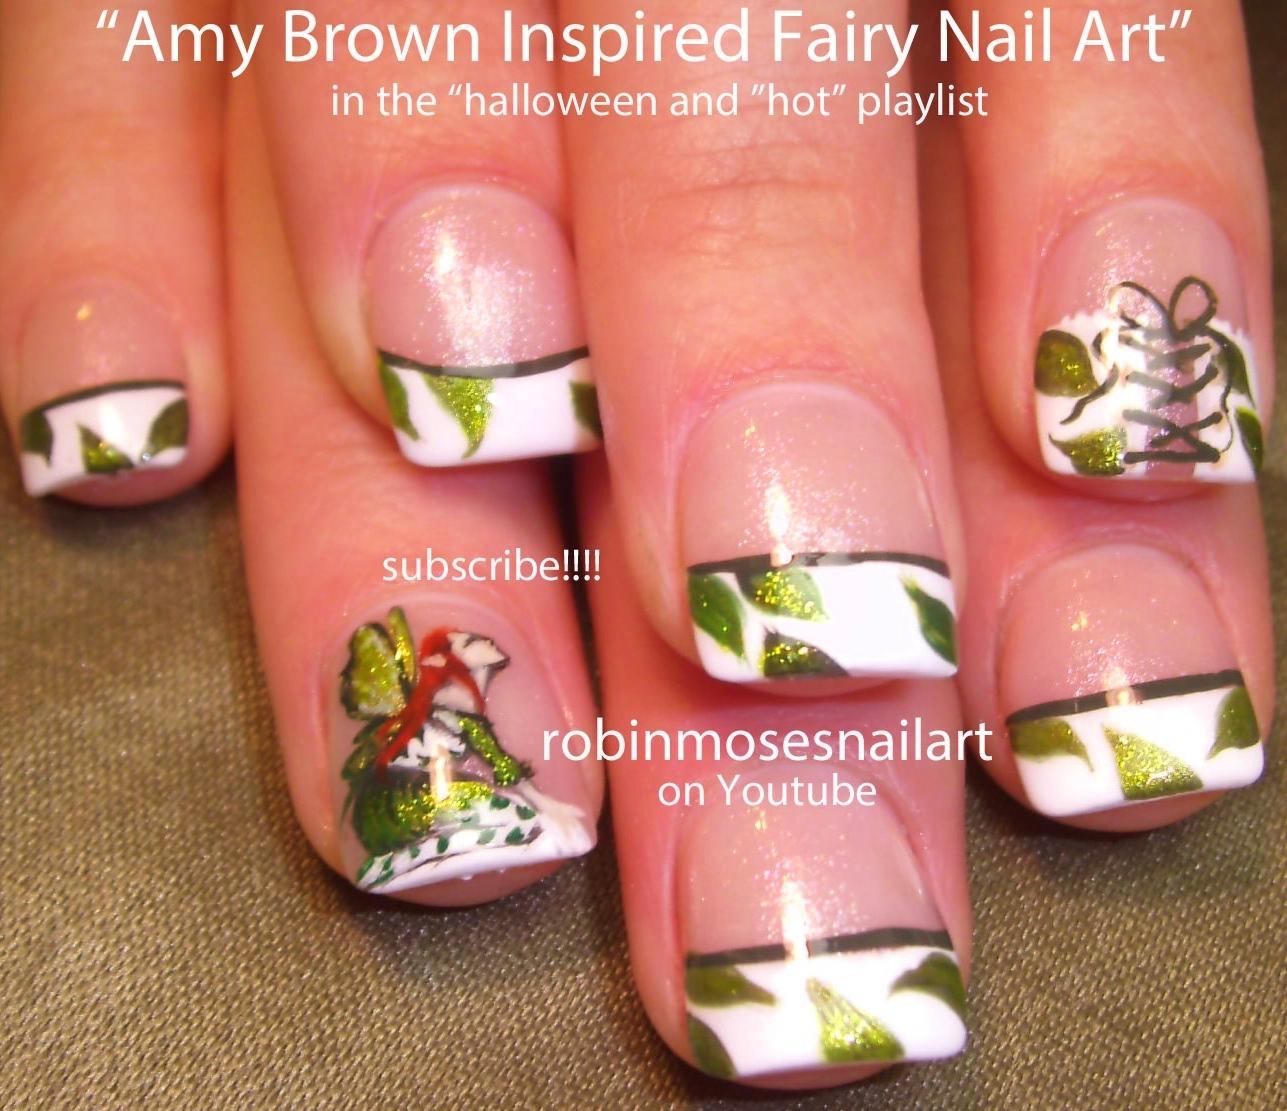 Robin Moses Nail Art: Cutest Amy Brown Fairy Nail Art ...